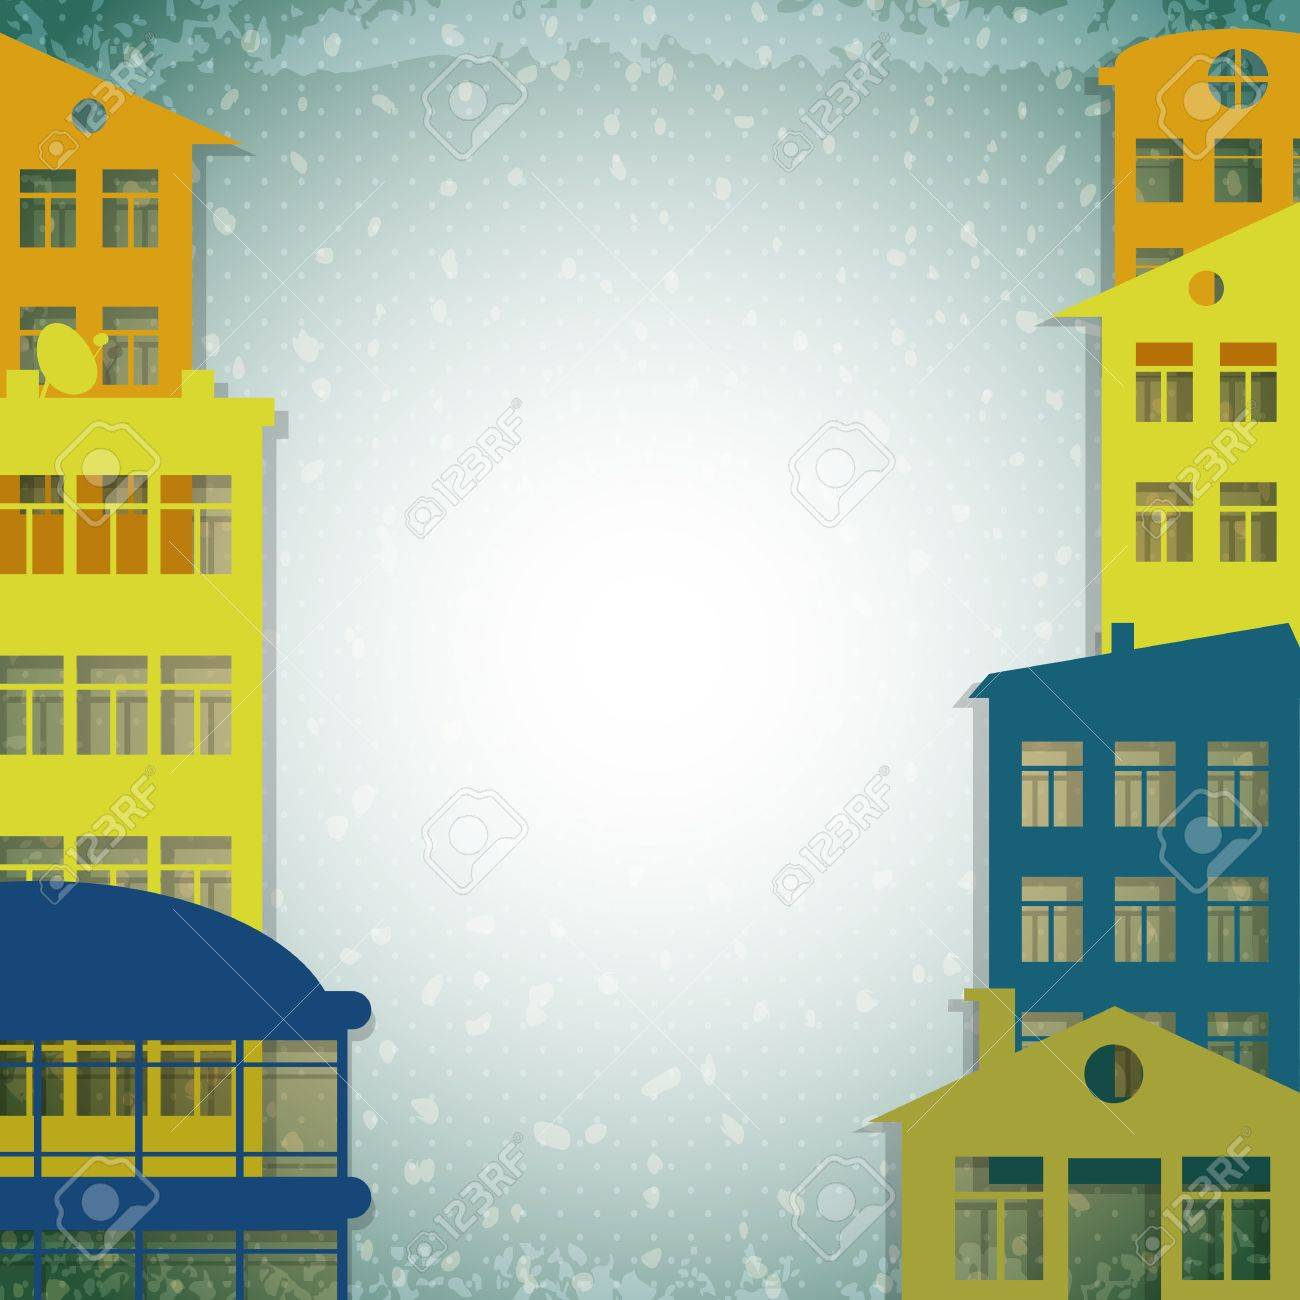 apartmert houses on vintage background Stock Vector - 17690193